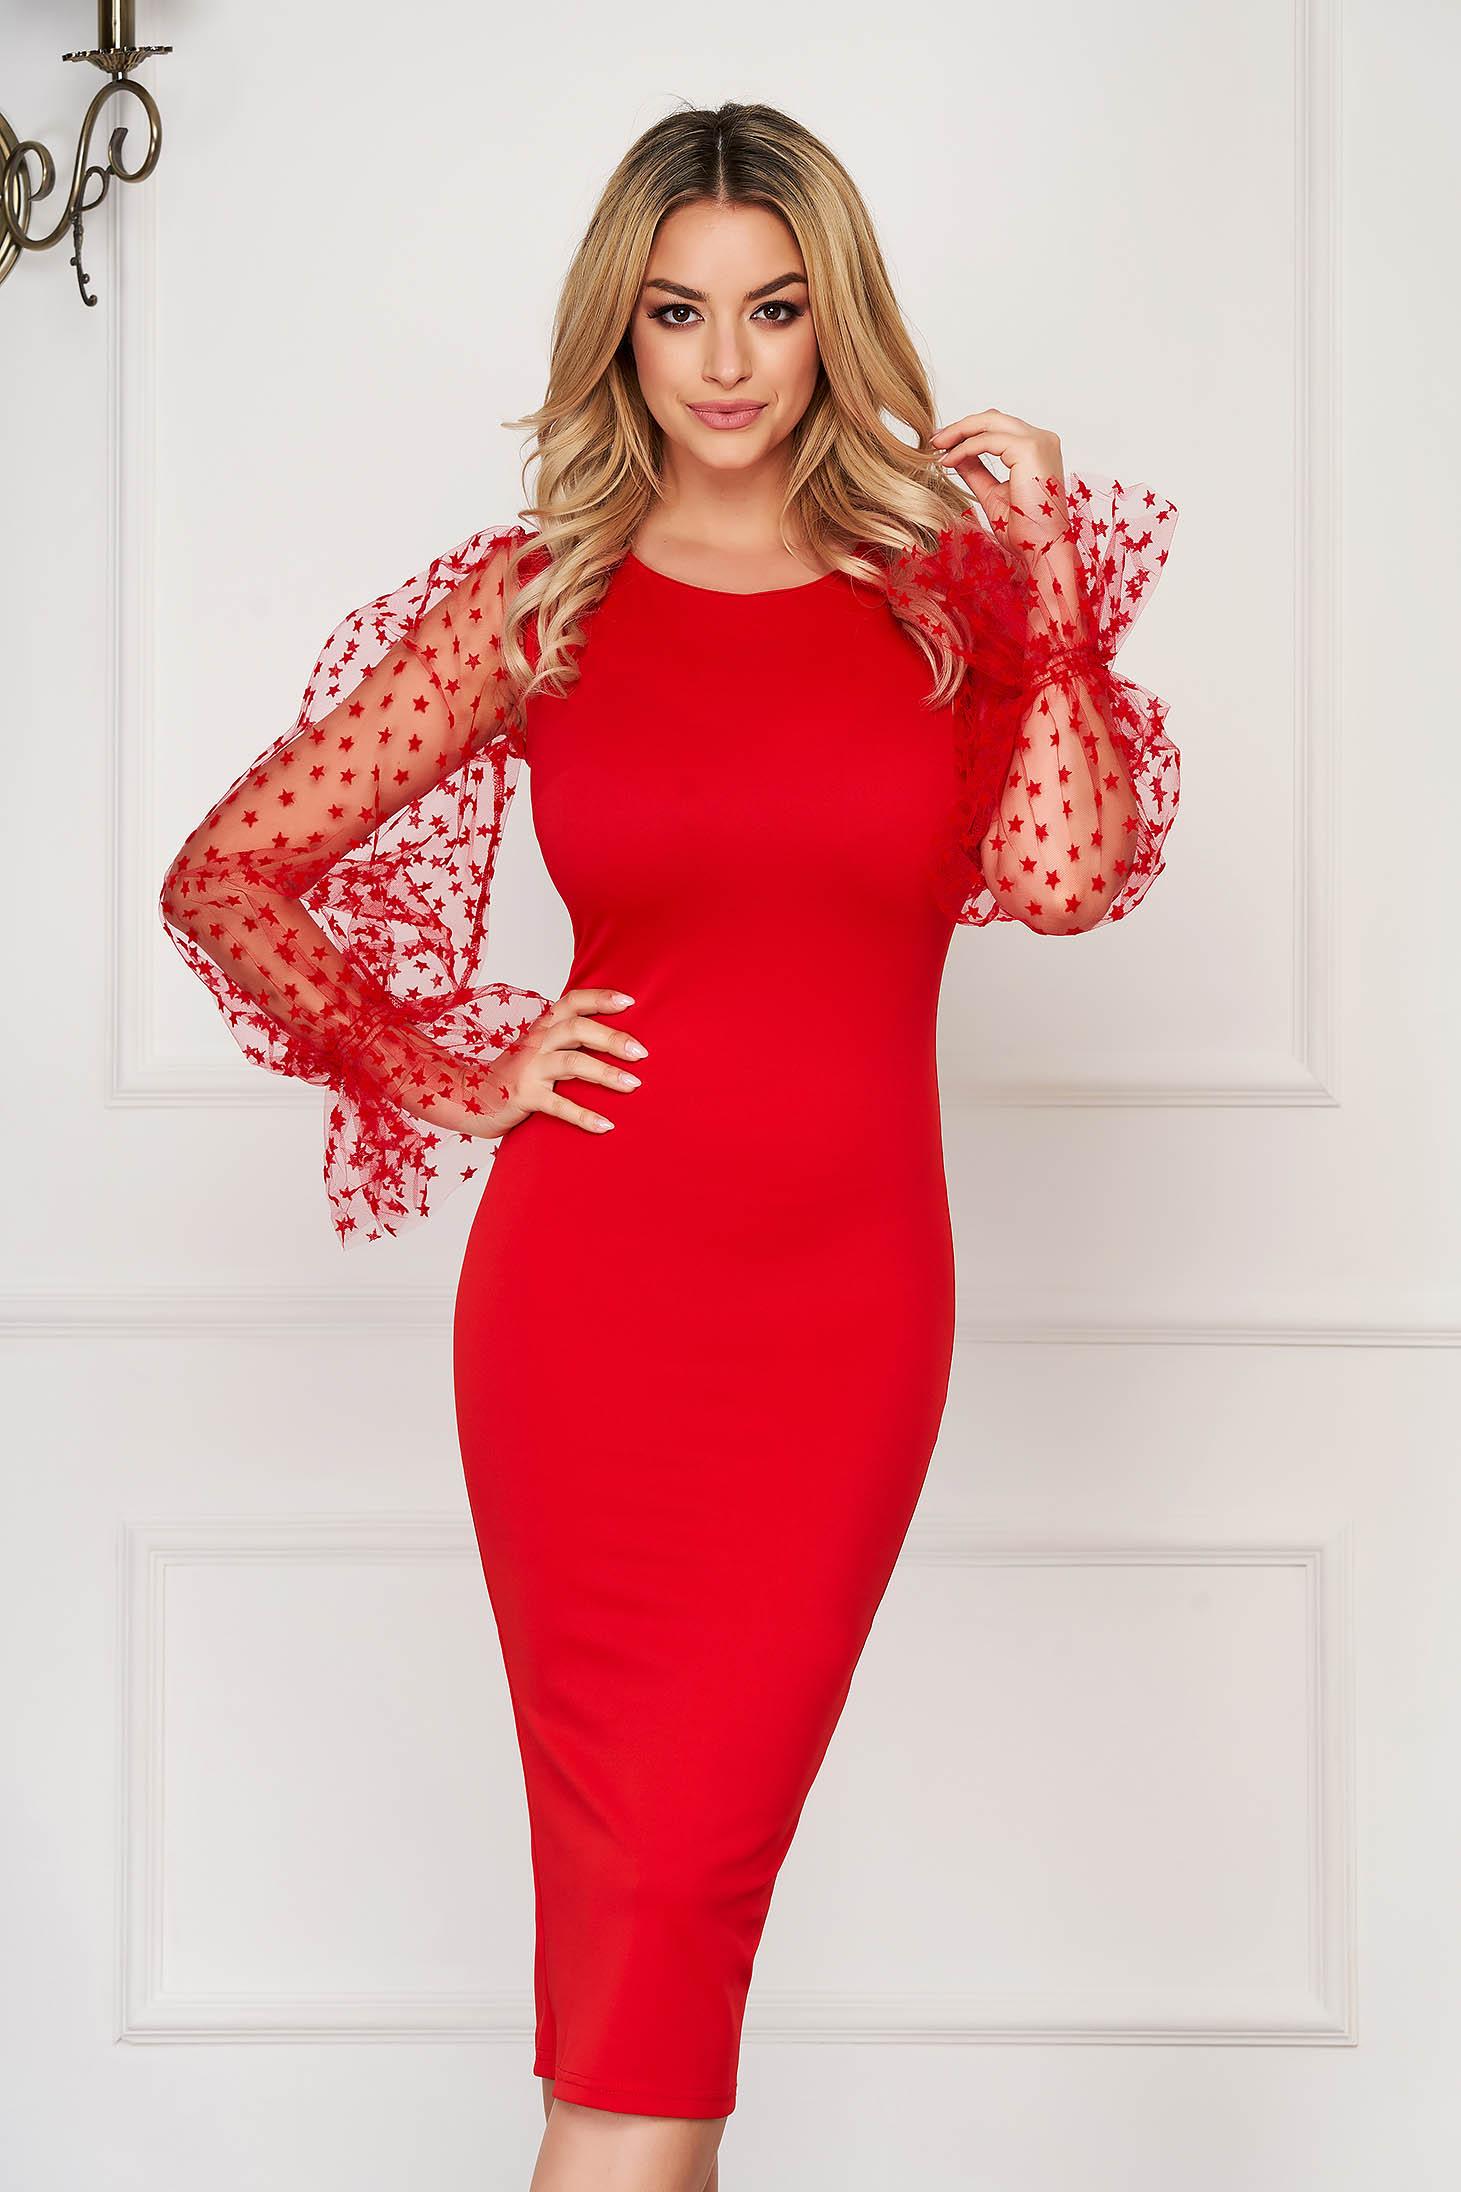 Rochie rosie de ocazie midi tip creion din material usor elastic cu decolteu rotunjit cu maneci lungi transparente